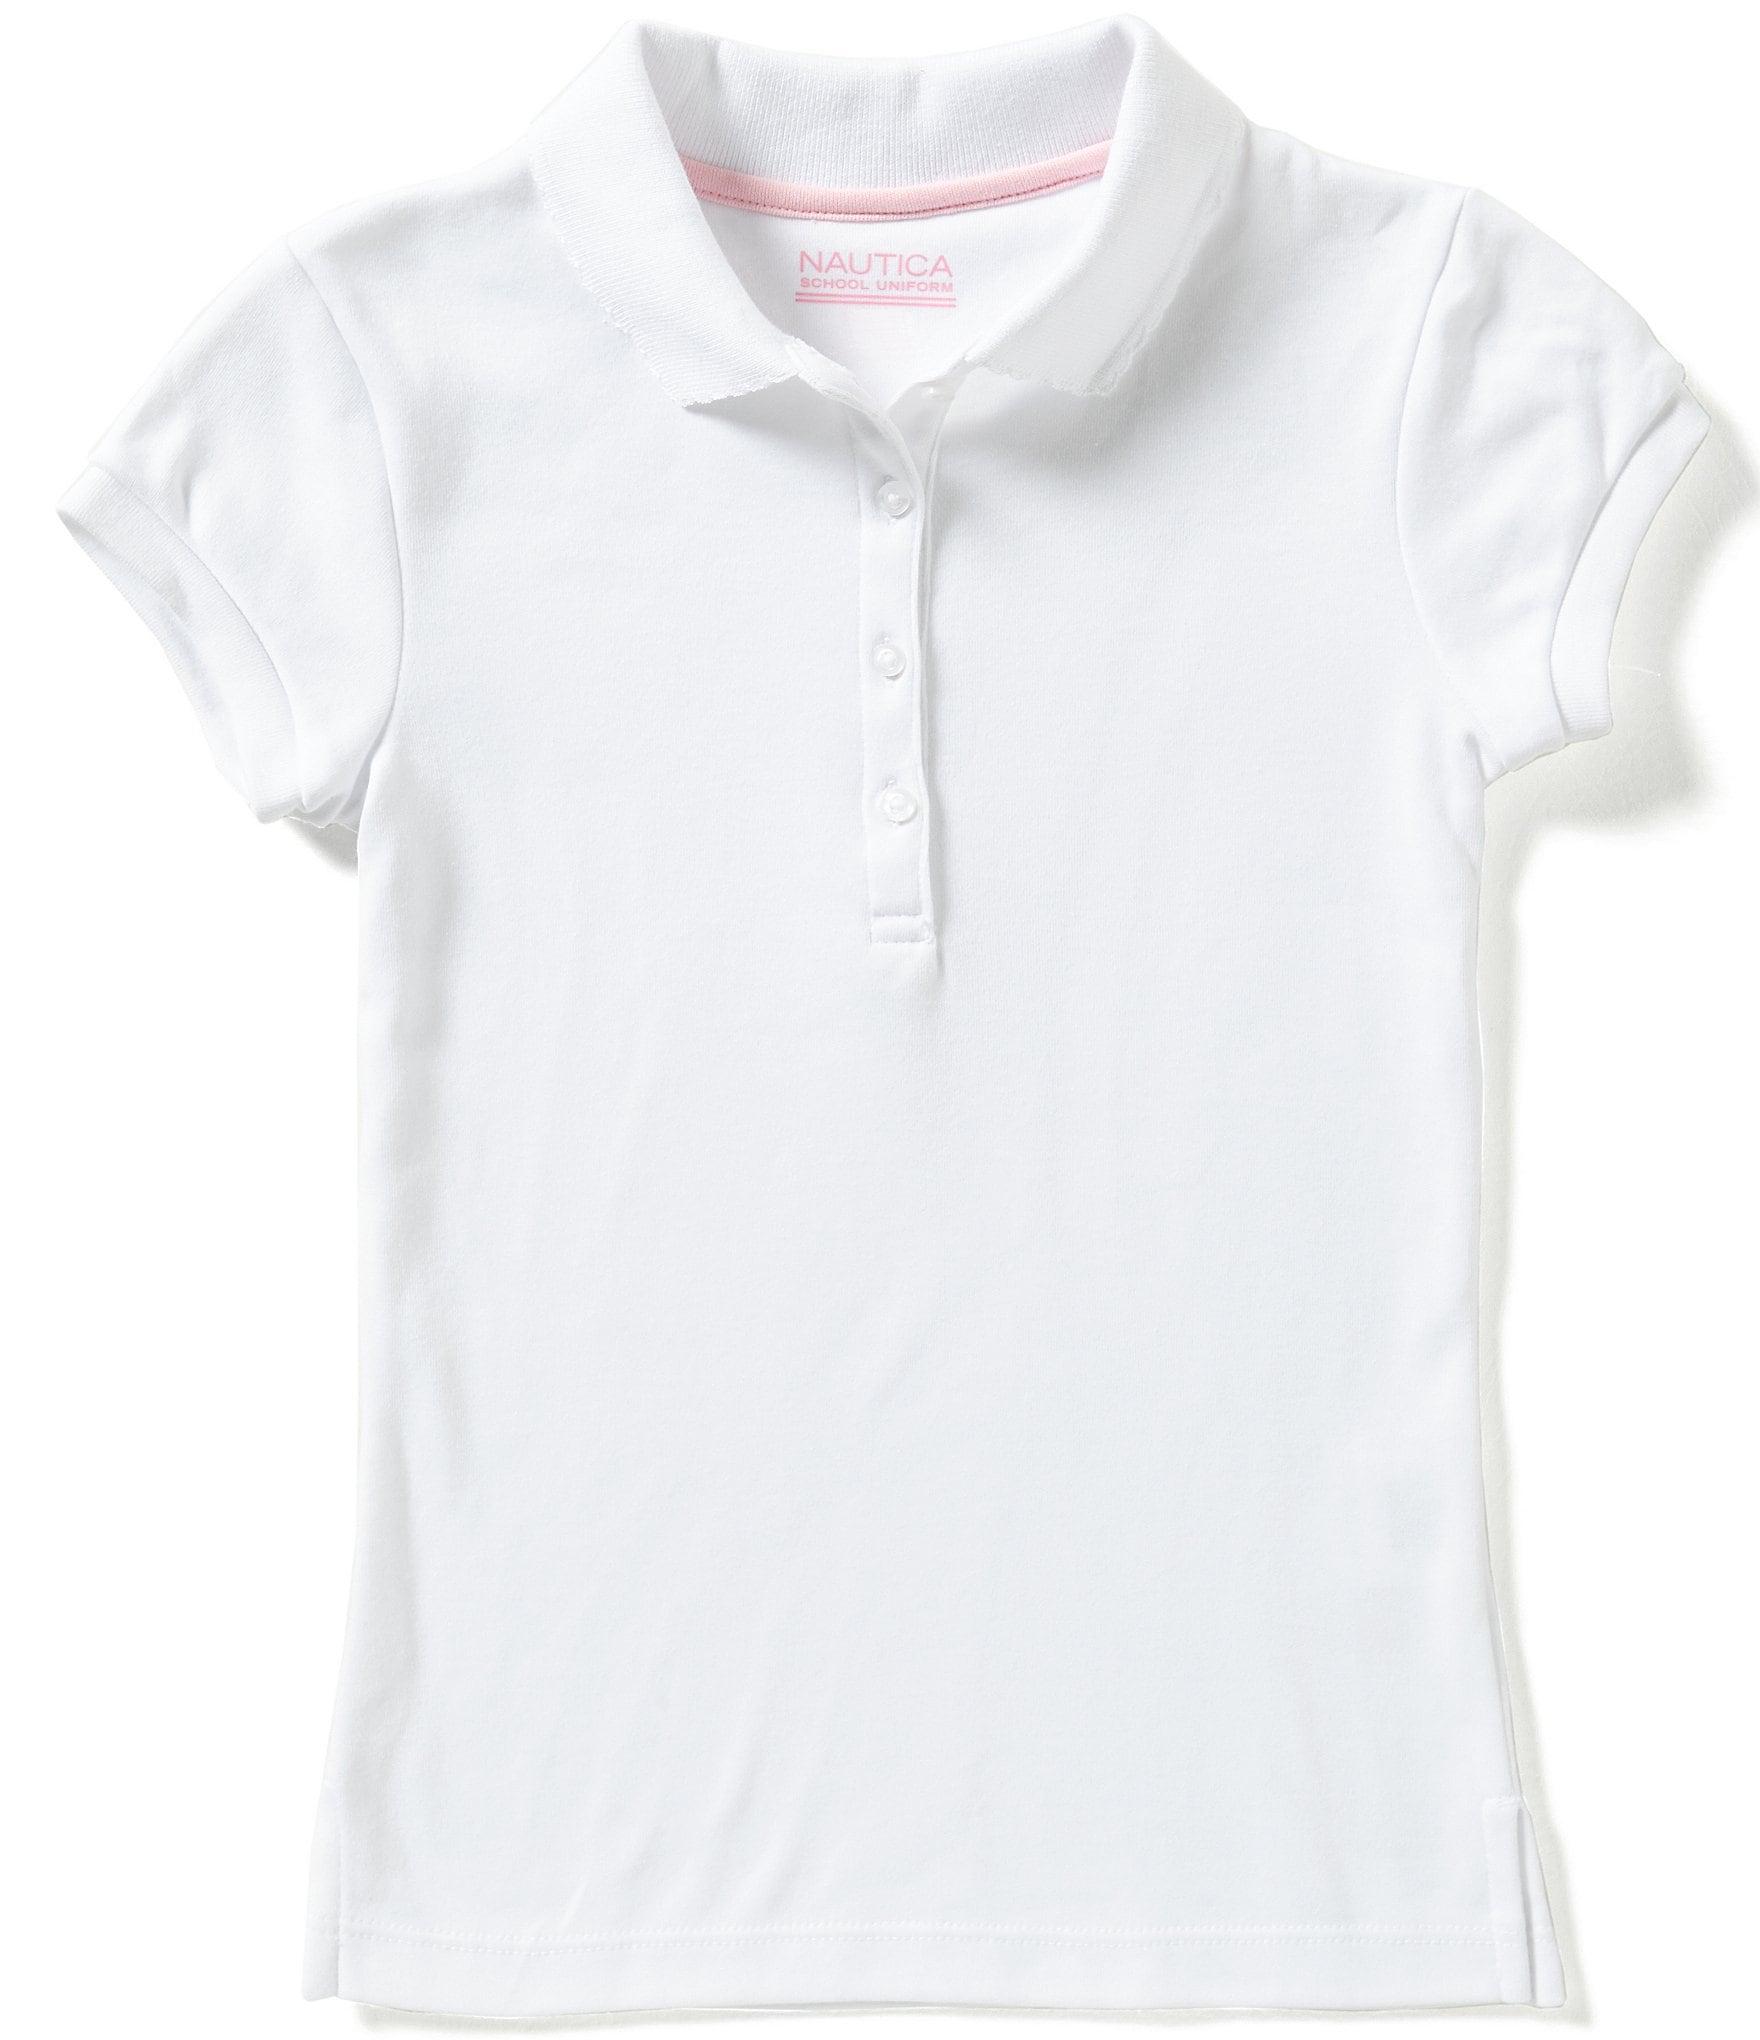 Nautica Big Girls 7-16 Short Sleeve Polo Shirt  Dillards-7837